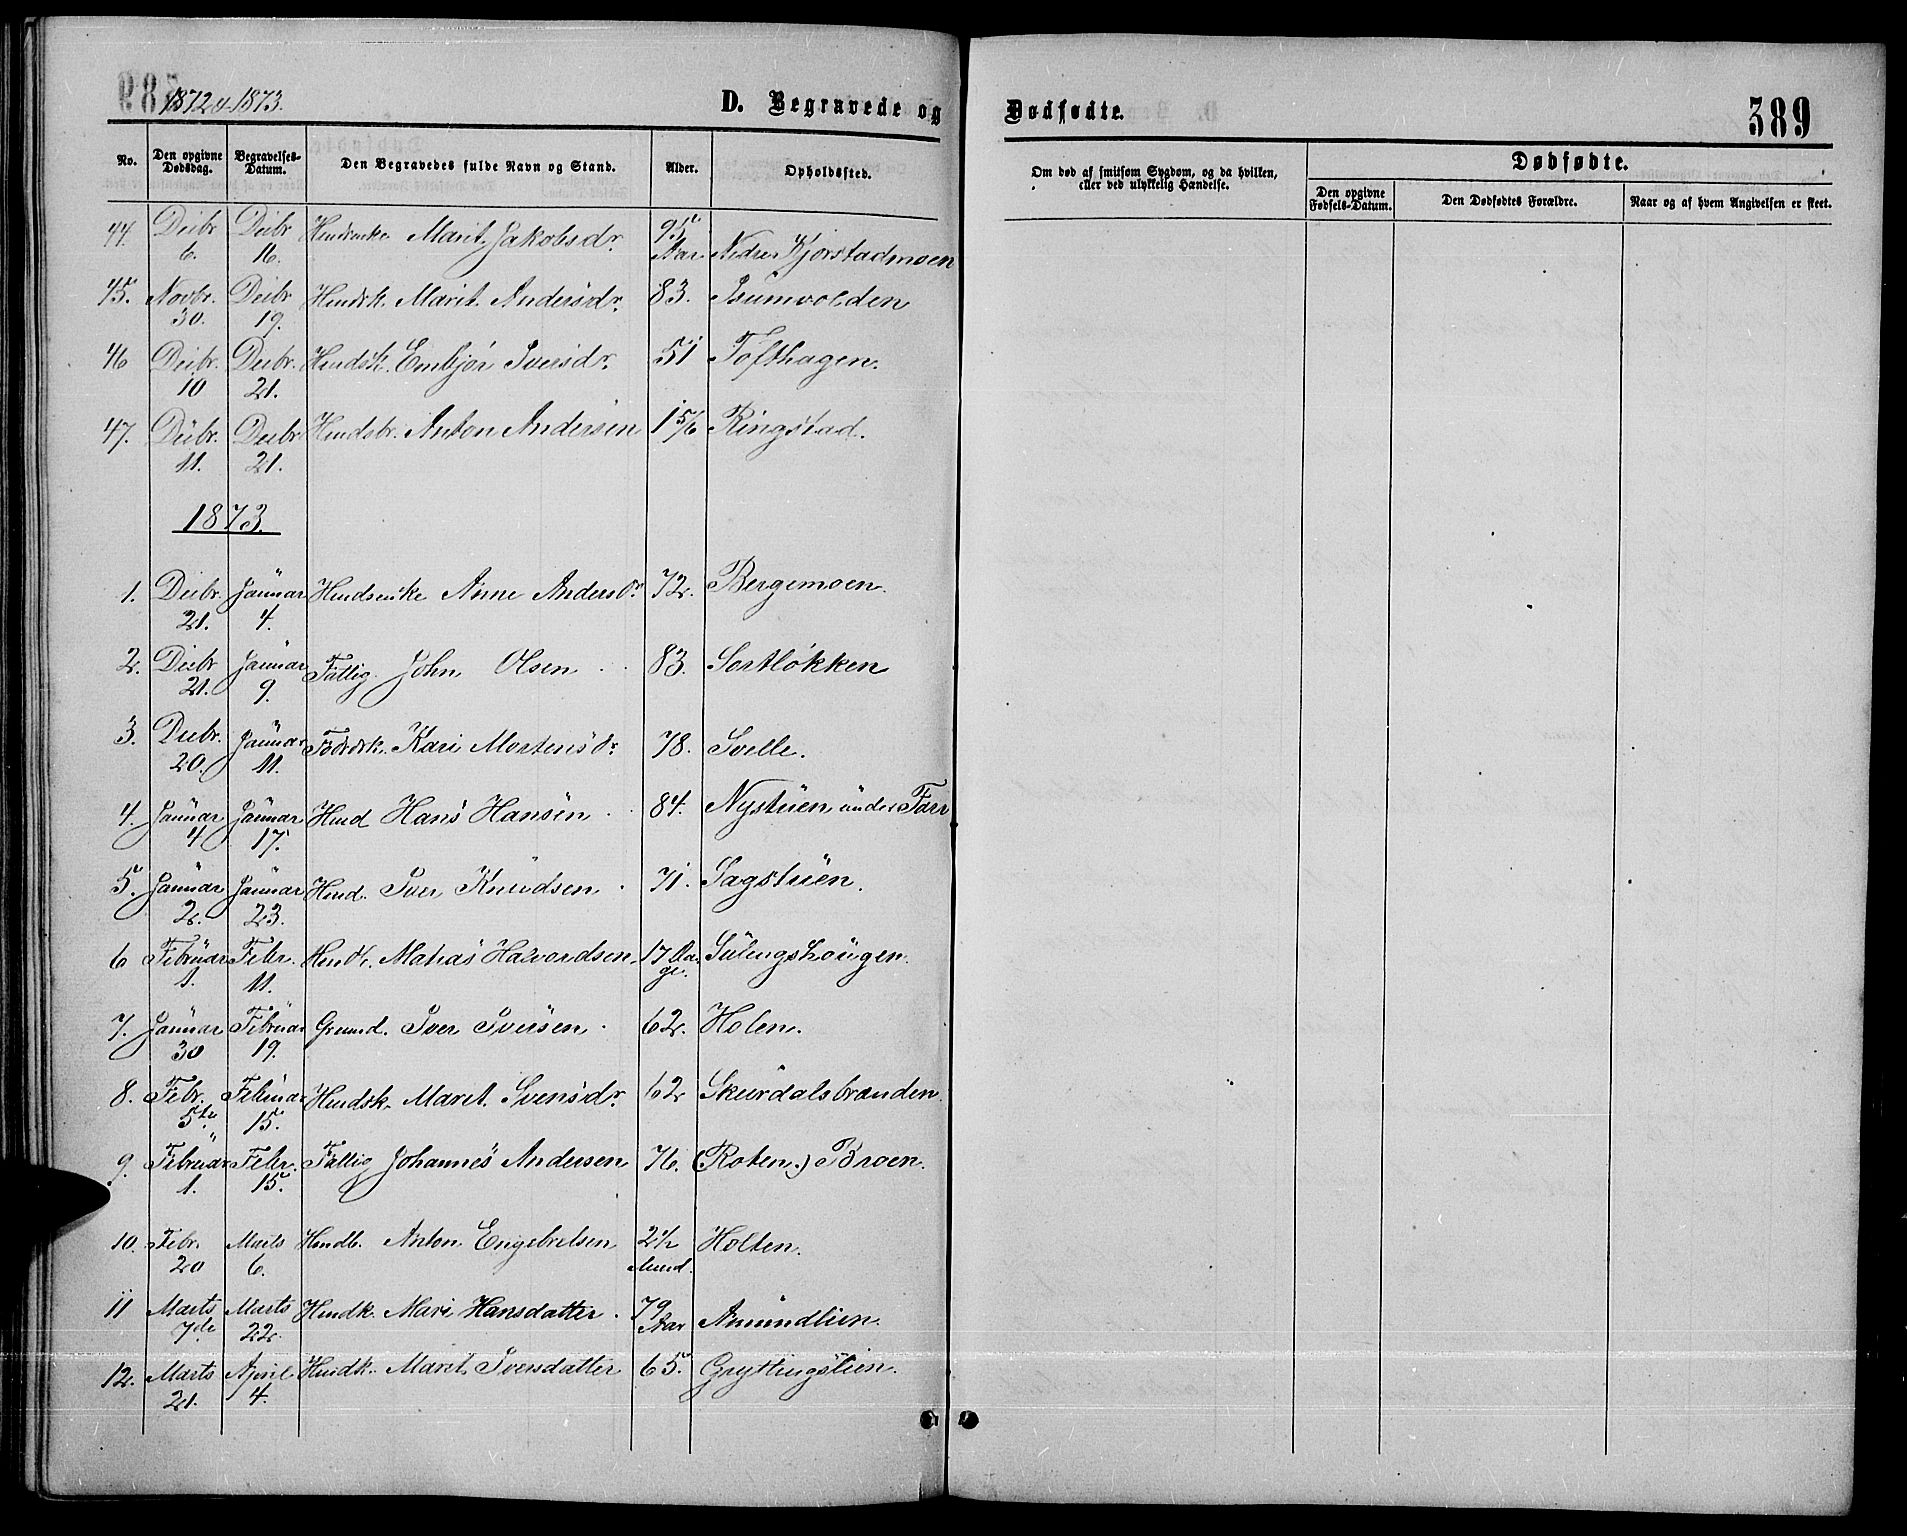 SAH, Sør-Fron prestekontor, H/Ha/Hab/L0002: Klokkerbok nr. 2, 1864-1883, s. 389